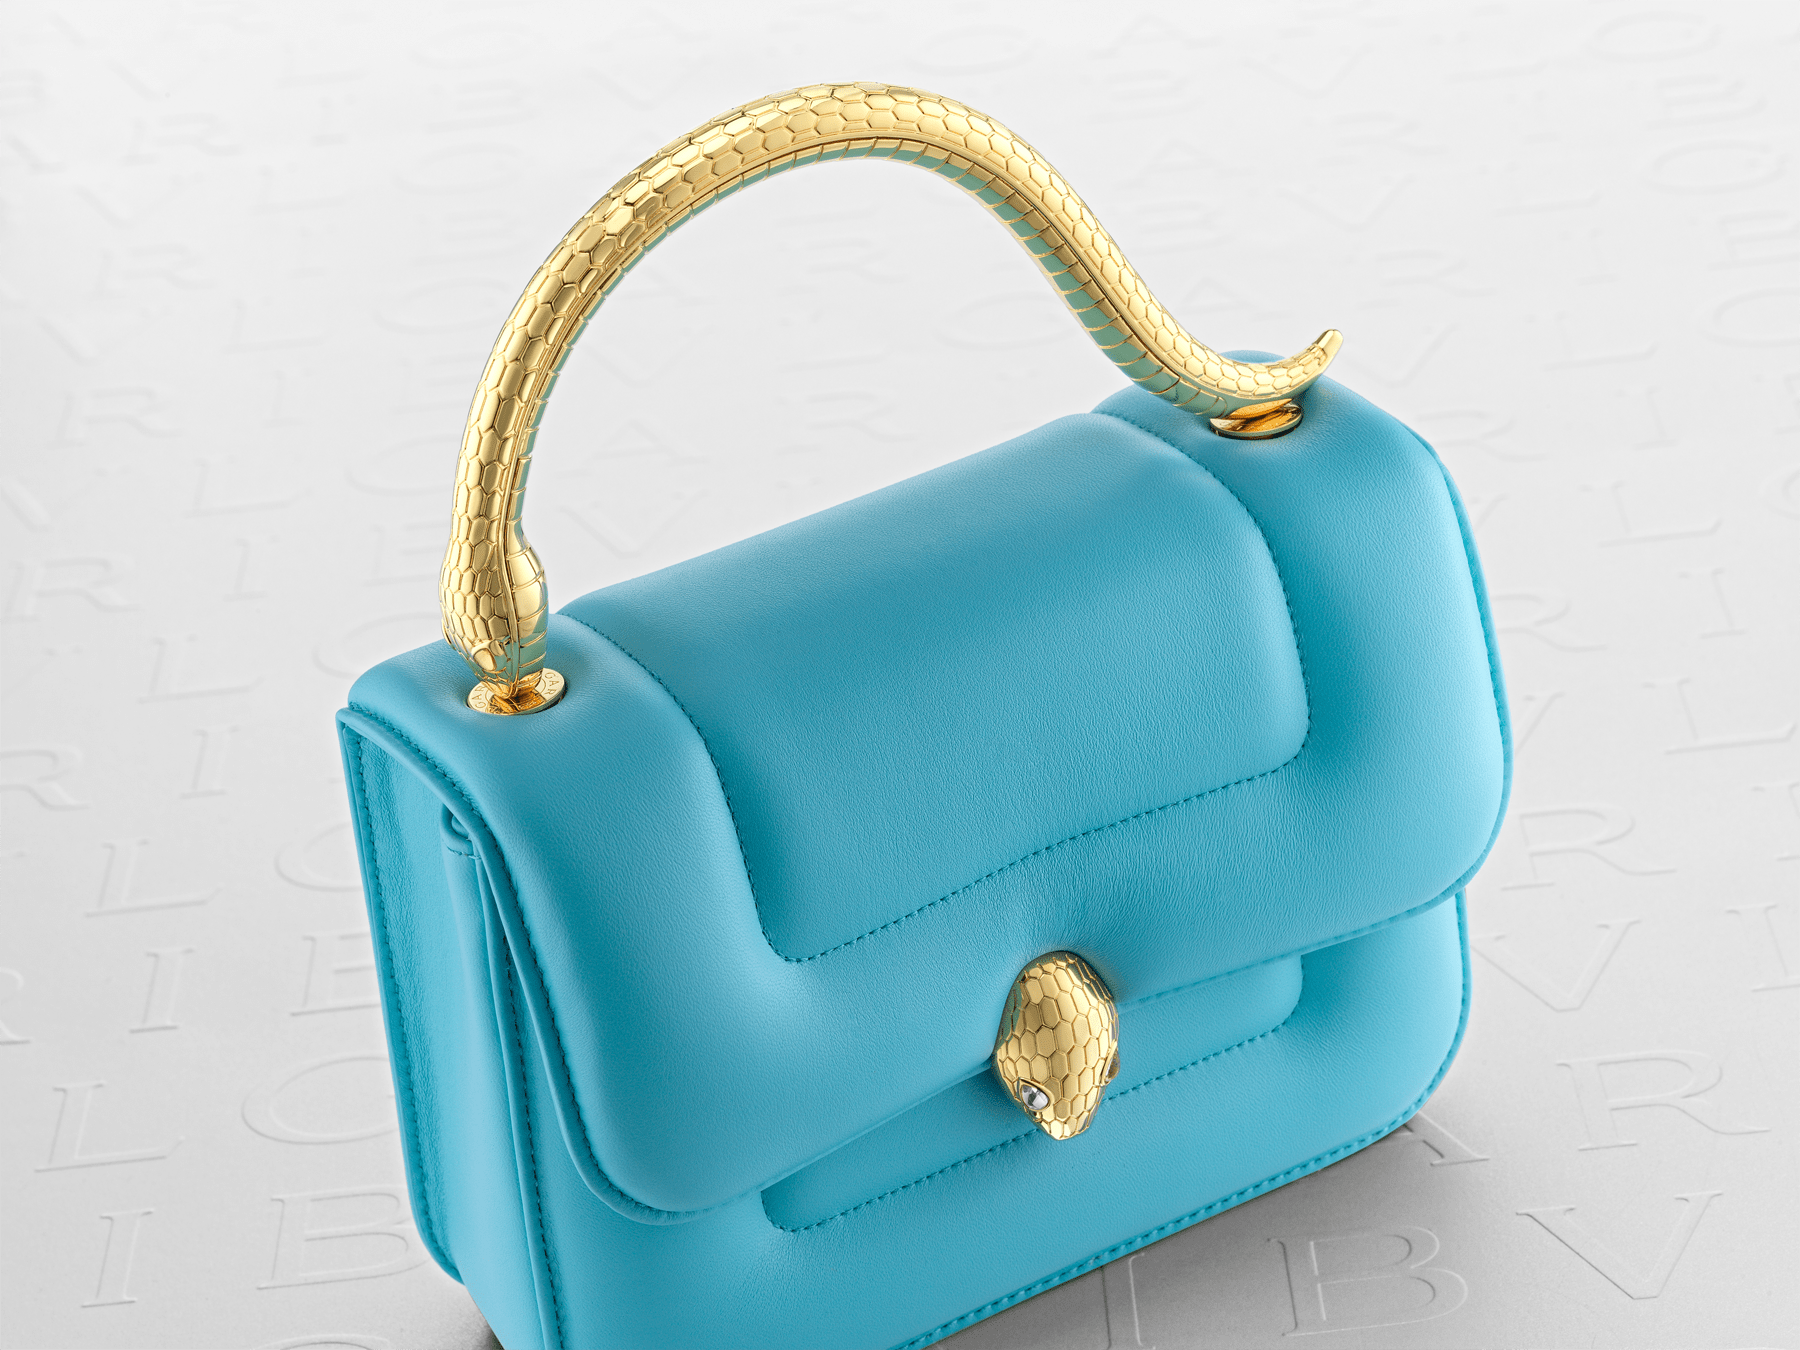 Mary Katrantzou x Bvlgari 手提包,採用柔軟的 Aegean Toapz 藍色絎縫納帕軟面皮,Aegean Toapz 藍色納帕軟面皮襯裡。新式金色黃銅 Serpenti 蛇頭扣環,誘人蛇眼鑲飾水晶。特別版包款。 MK-1142 image 9